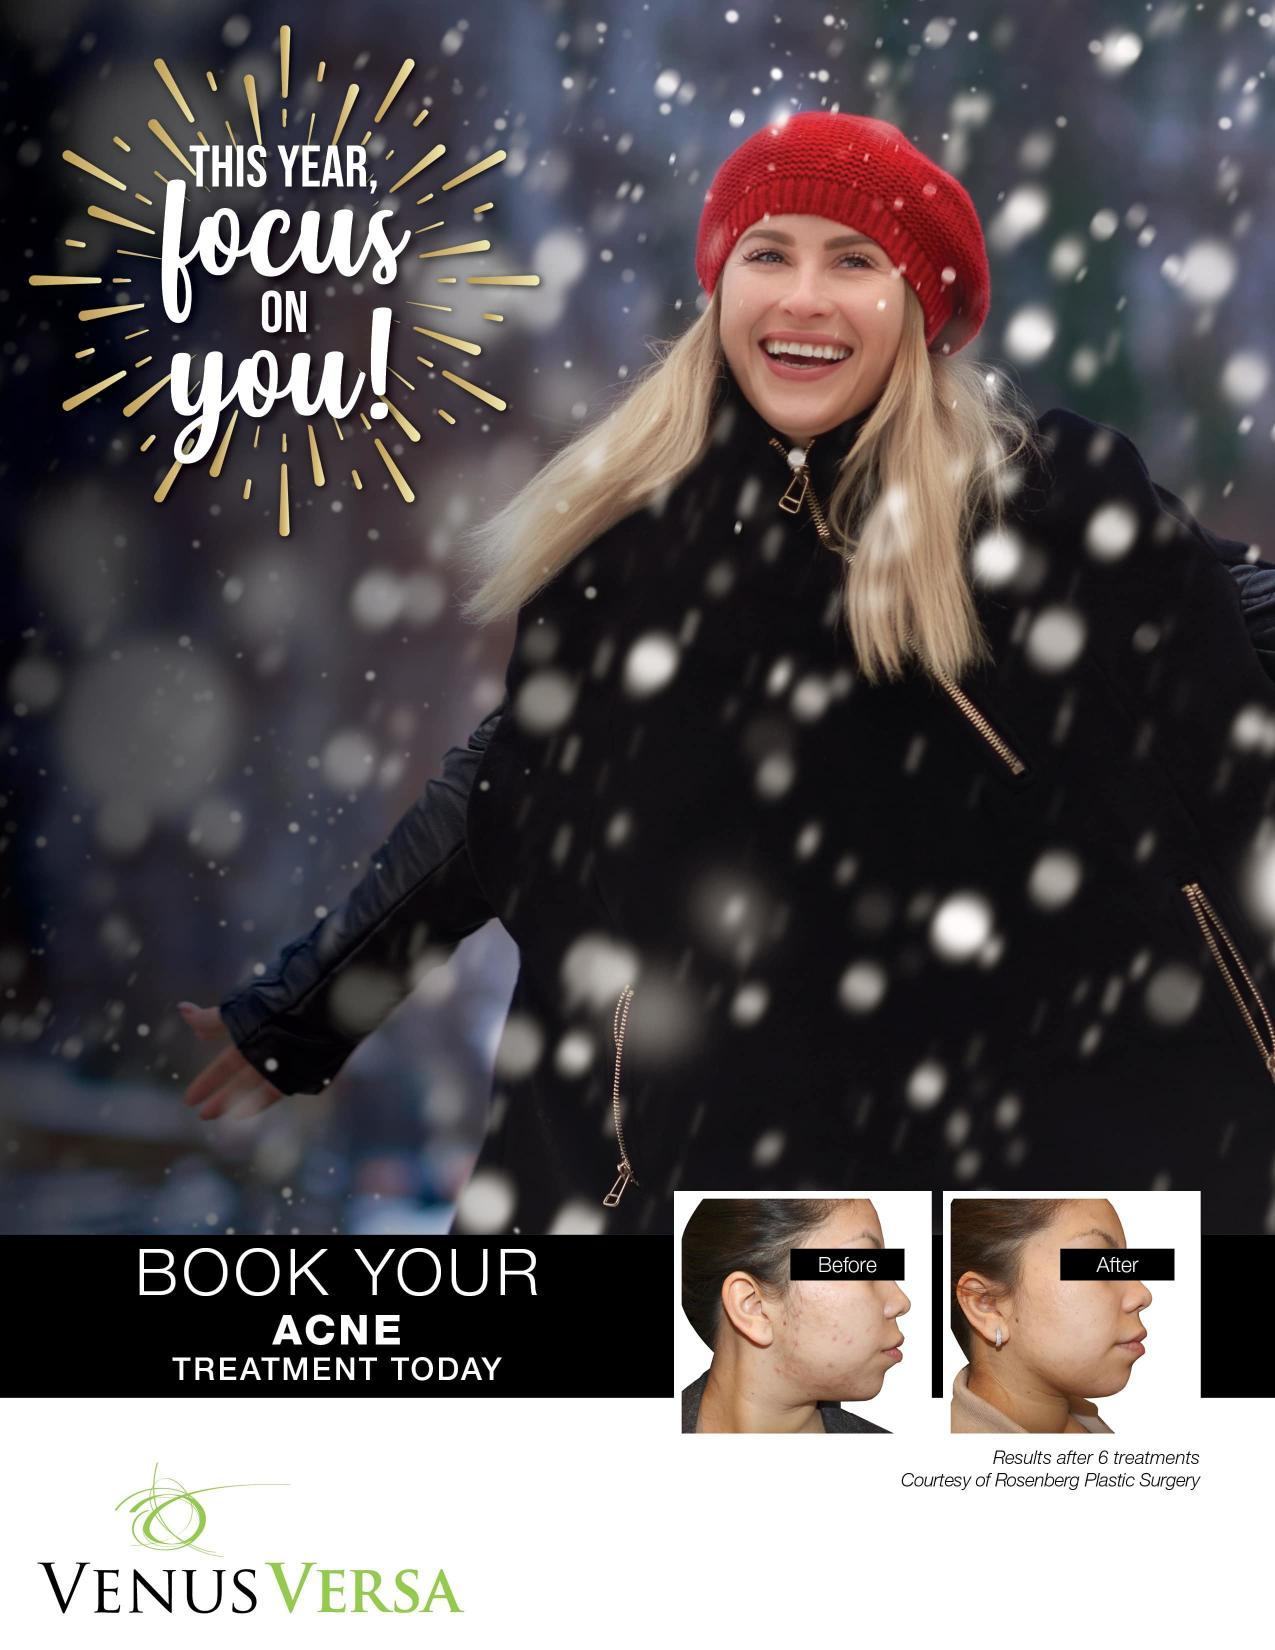 Acne Reduction With Venus Versa